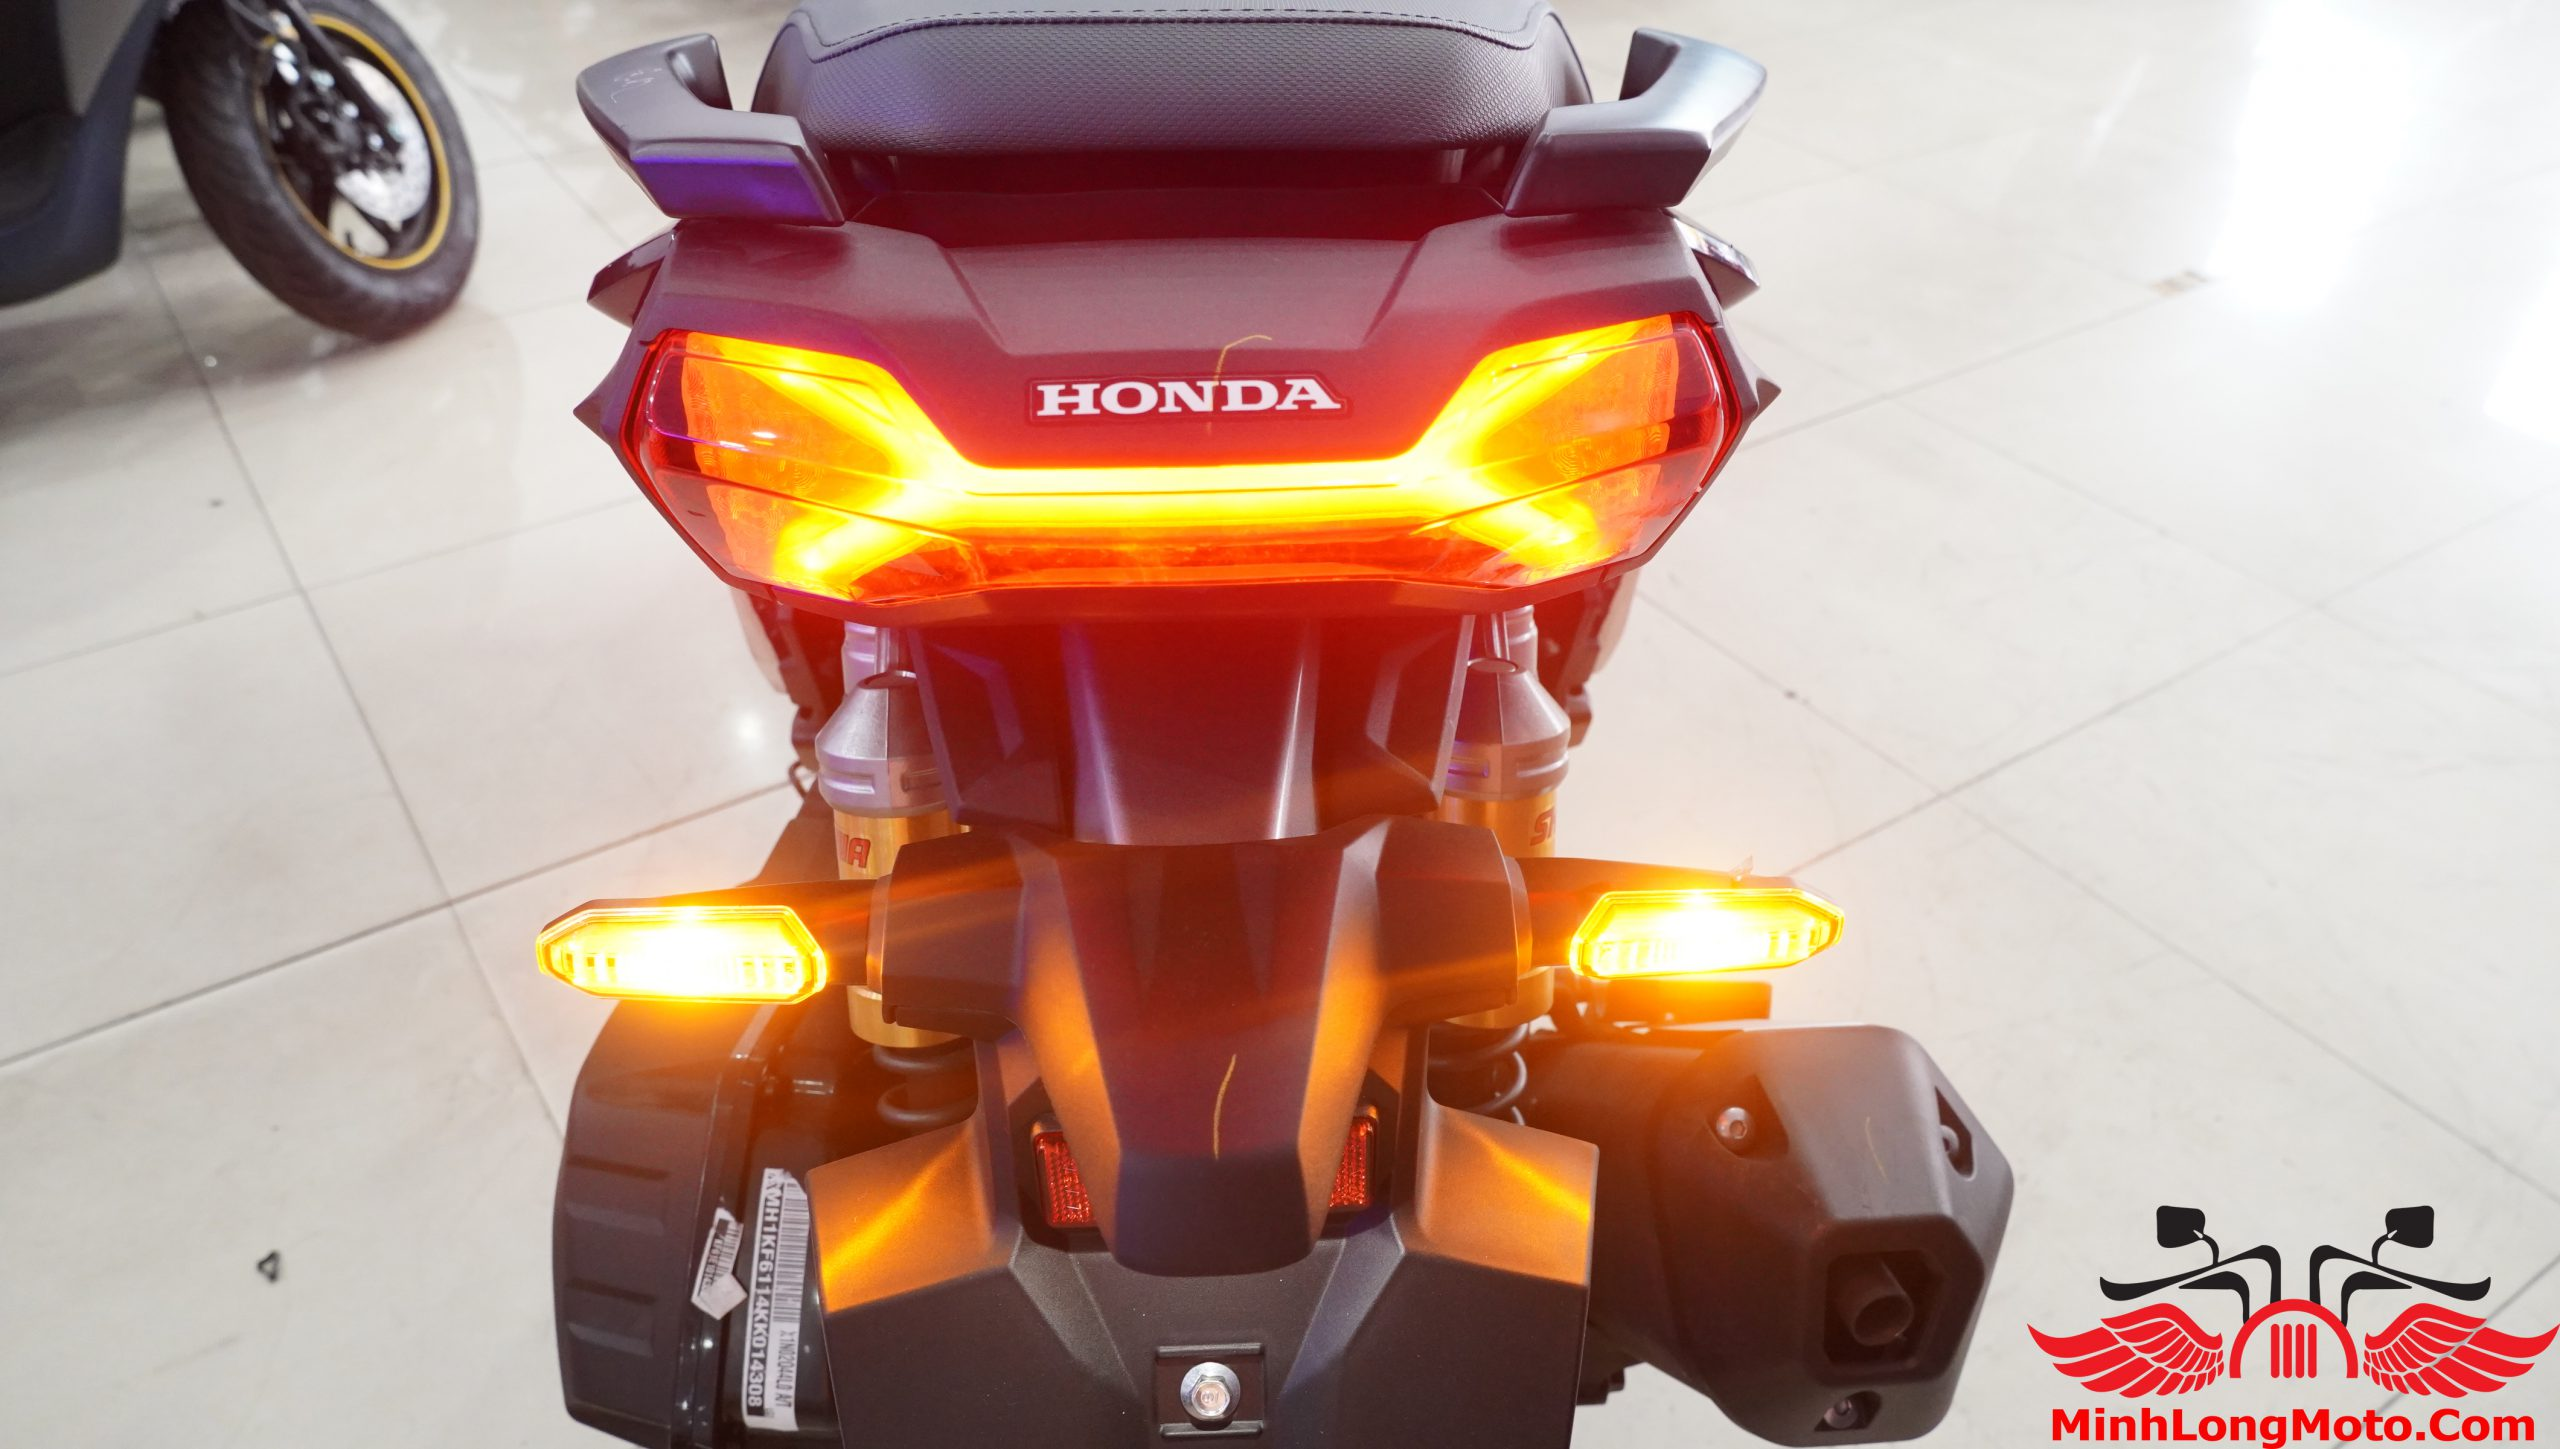 xi nhan Honda ADV 150 2020